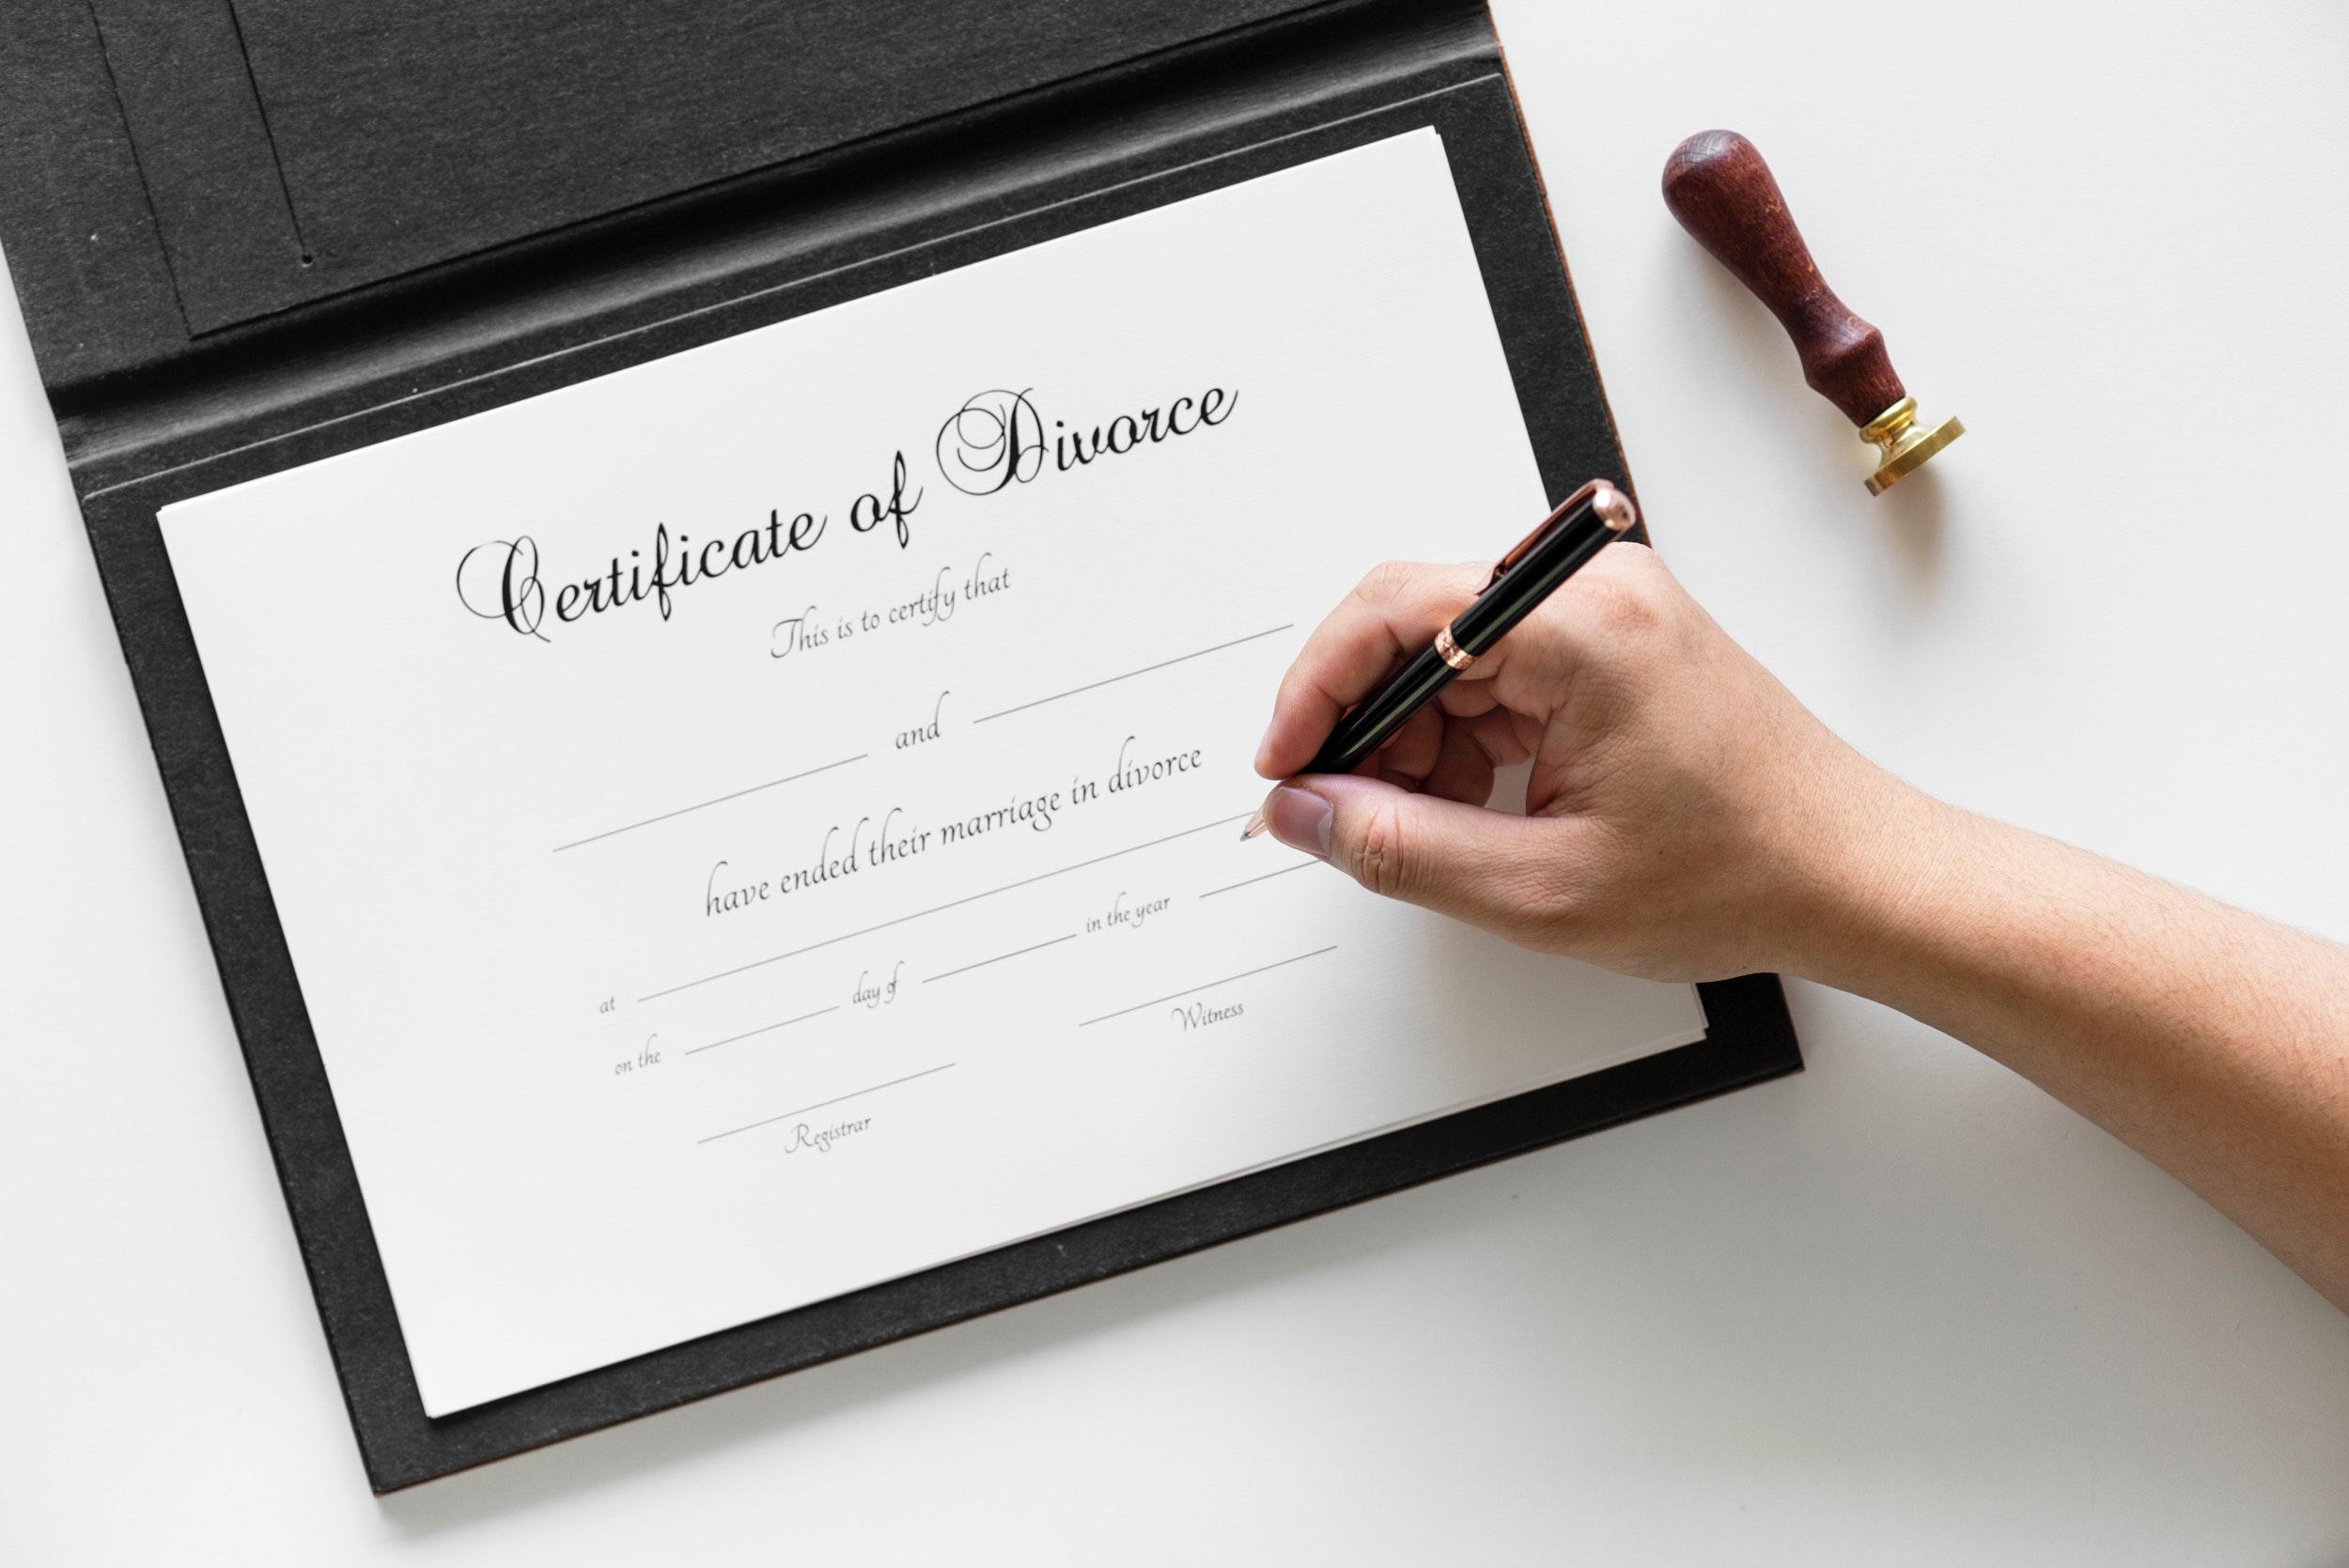 agreement-blank-contract-1011325.jpg